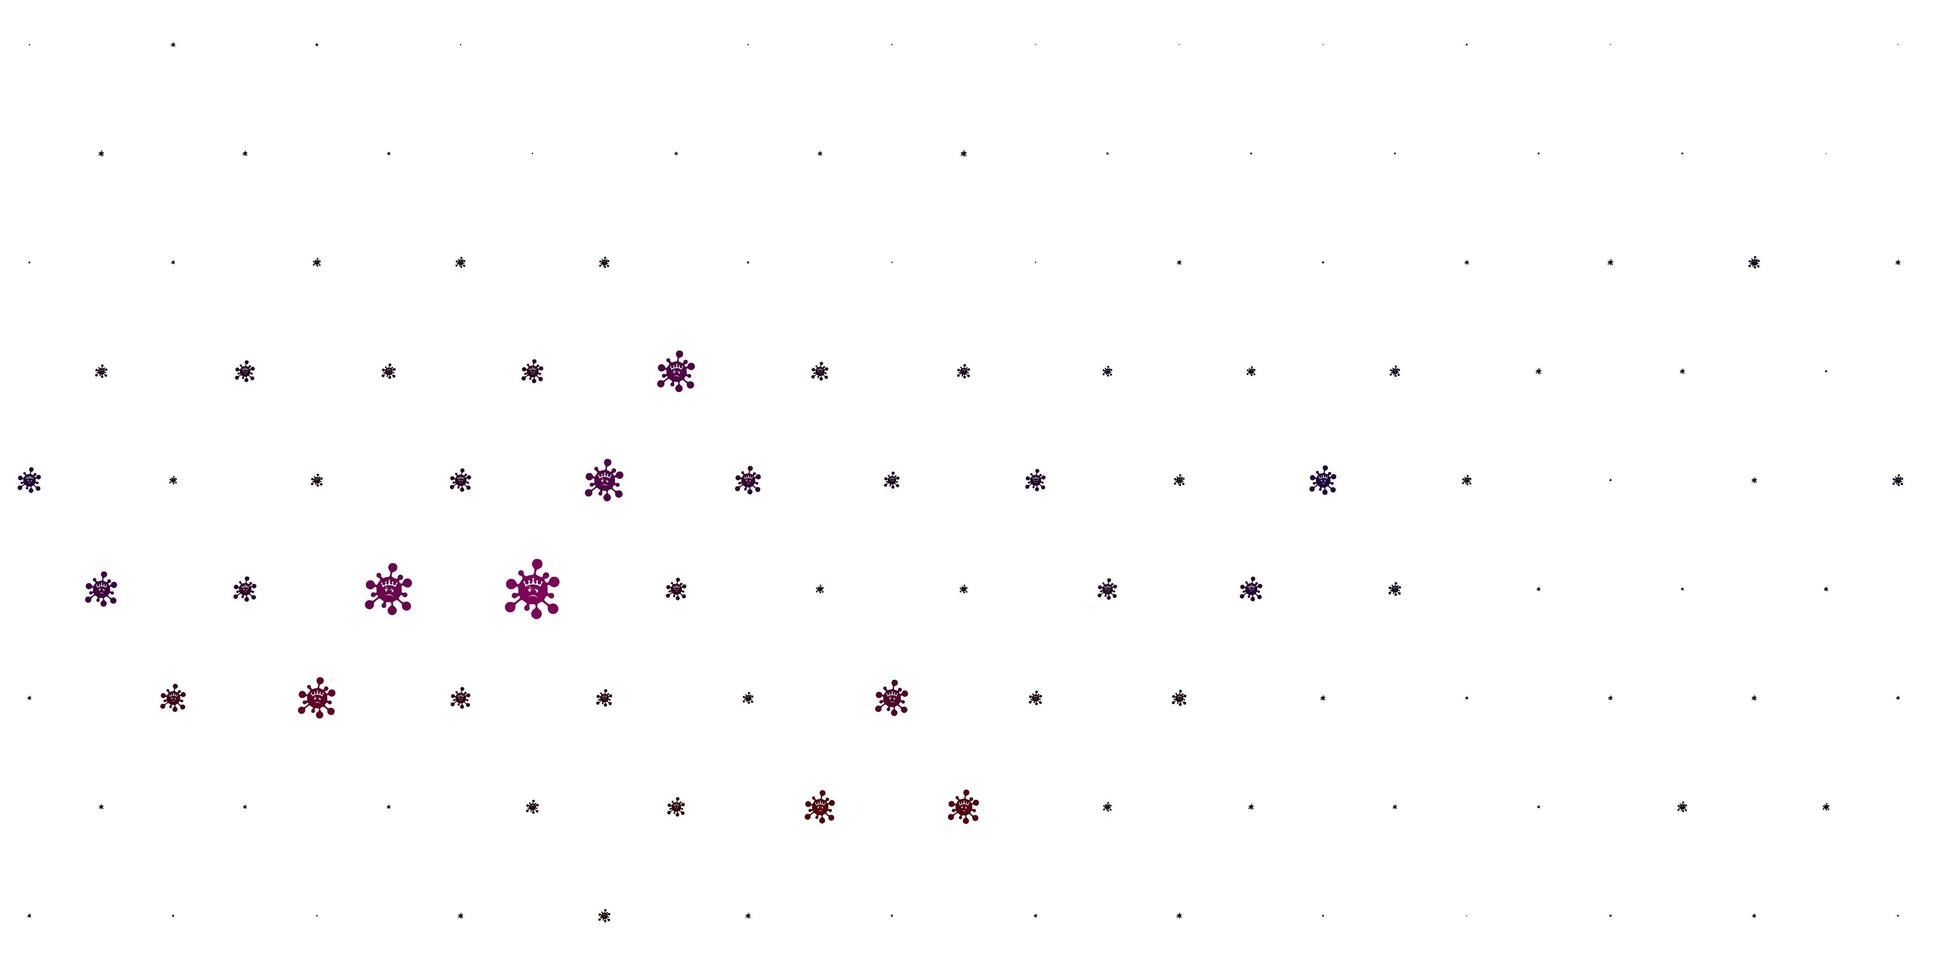 patrón de vector rosa claro, rojo con elementos de coronavirus.